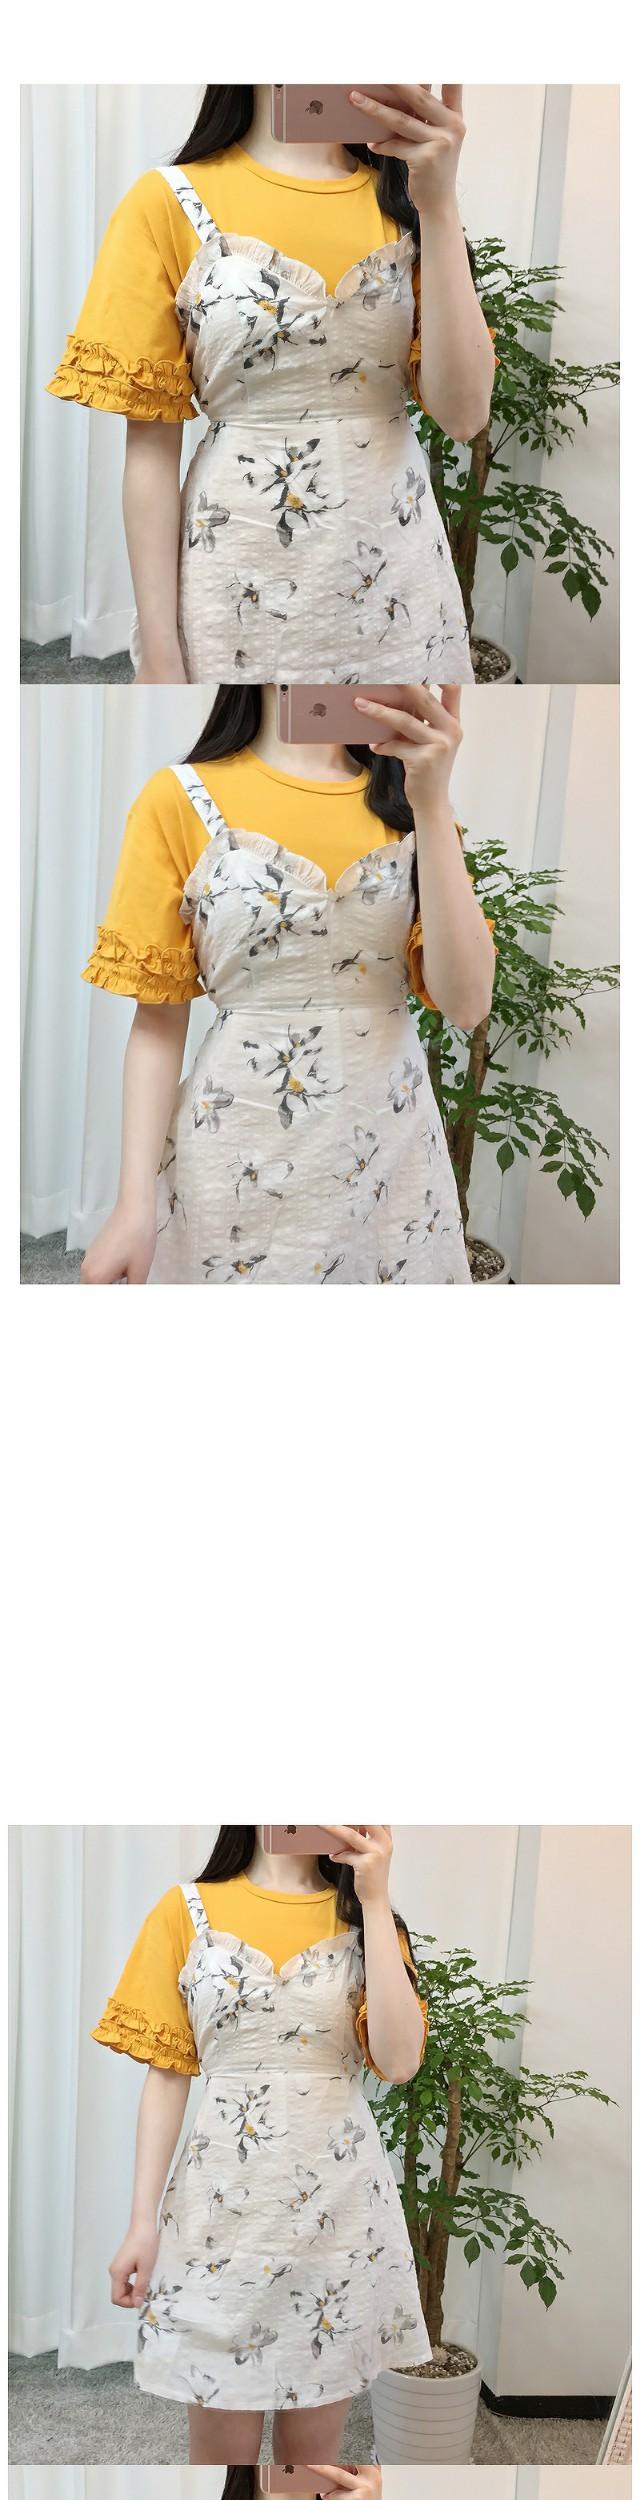 Rubber bustier dress